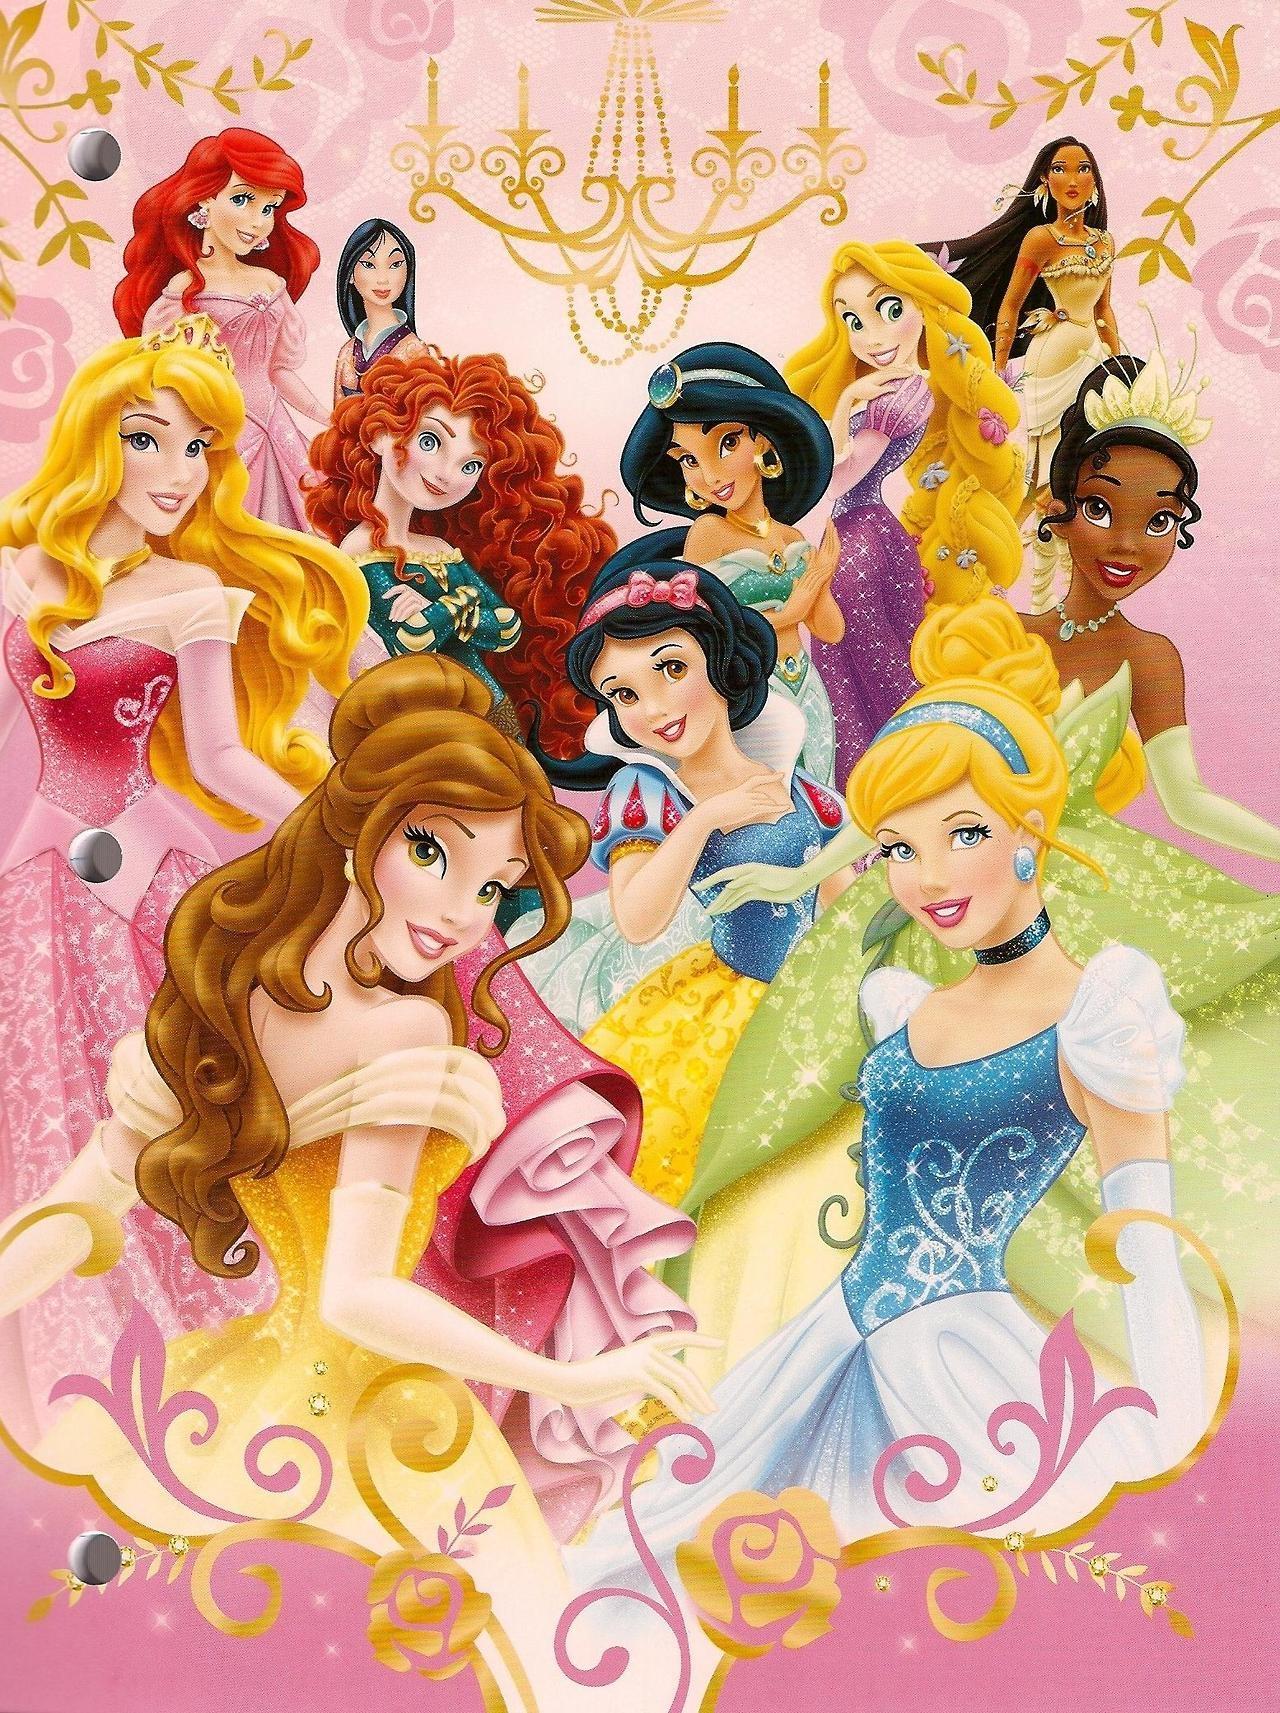 Disney princess hd wallpaper free download - Image de princesse disney ...